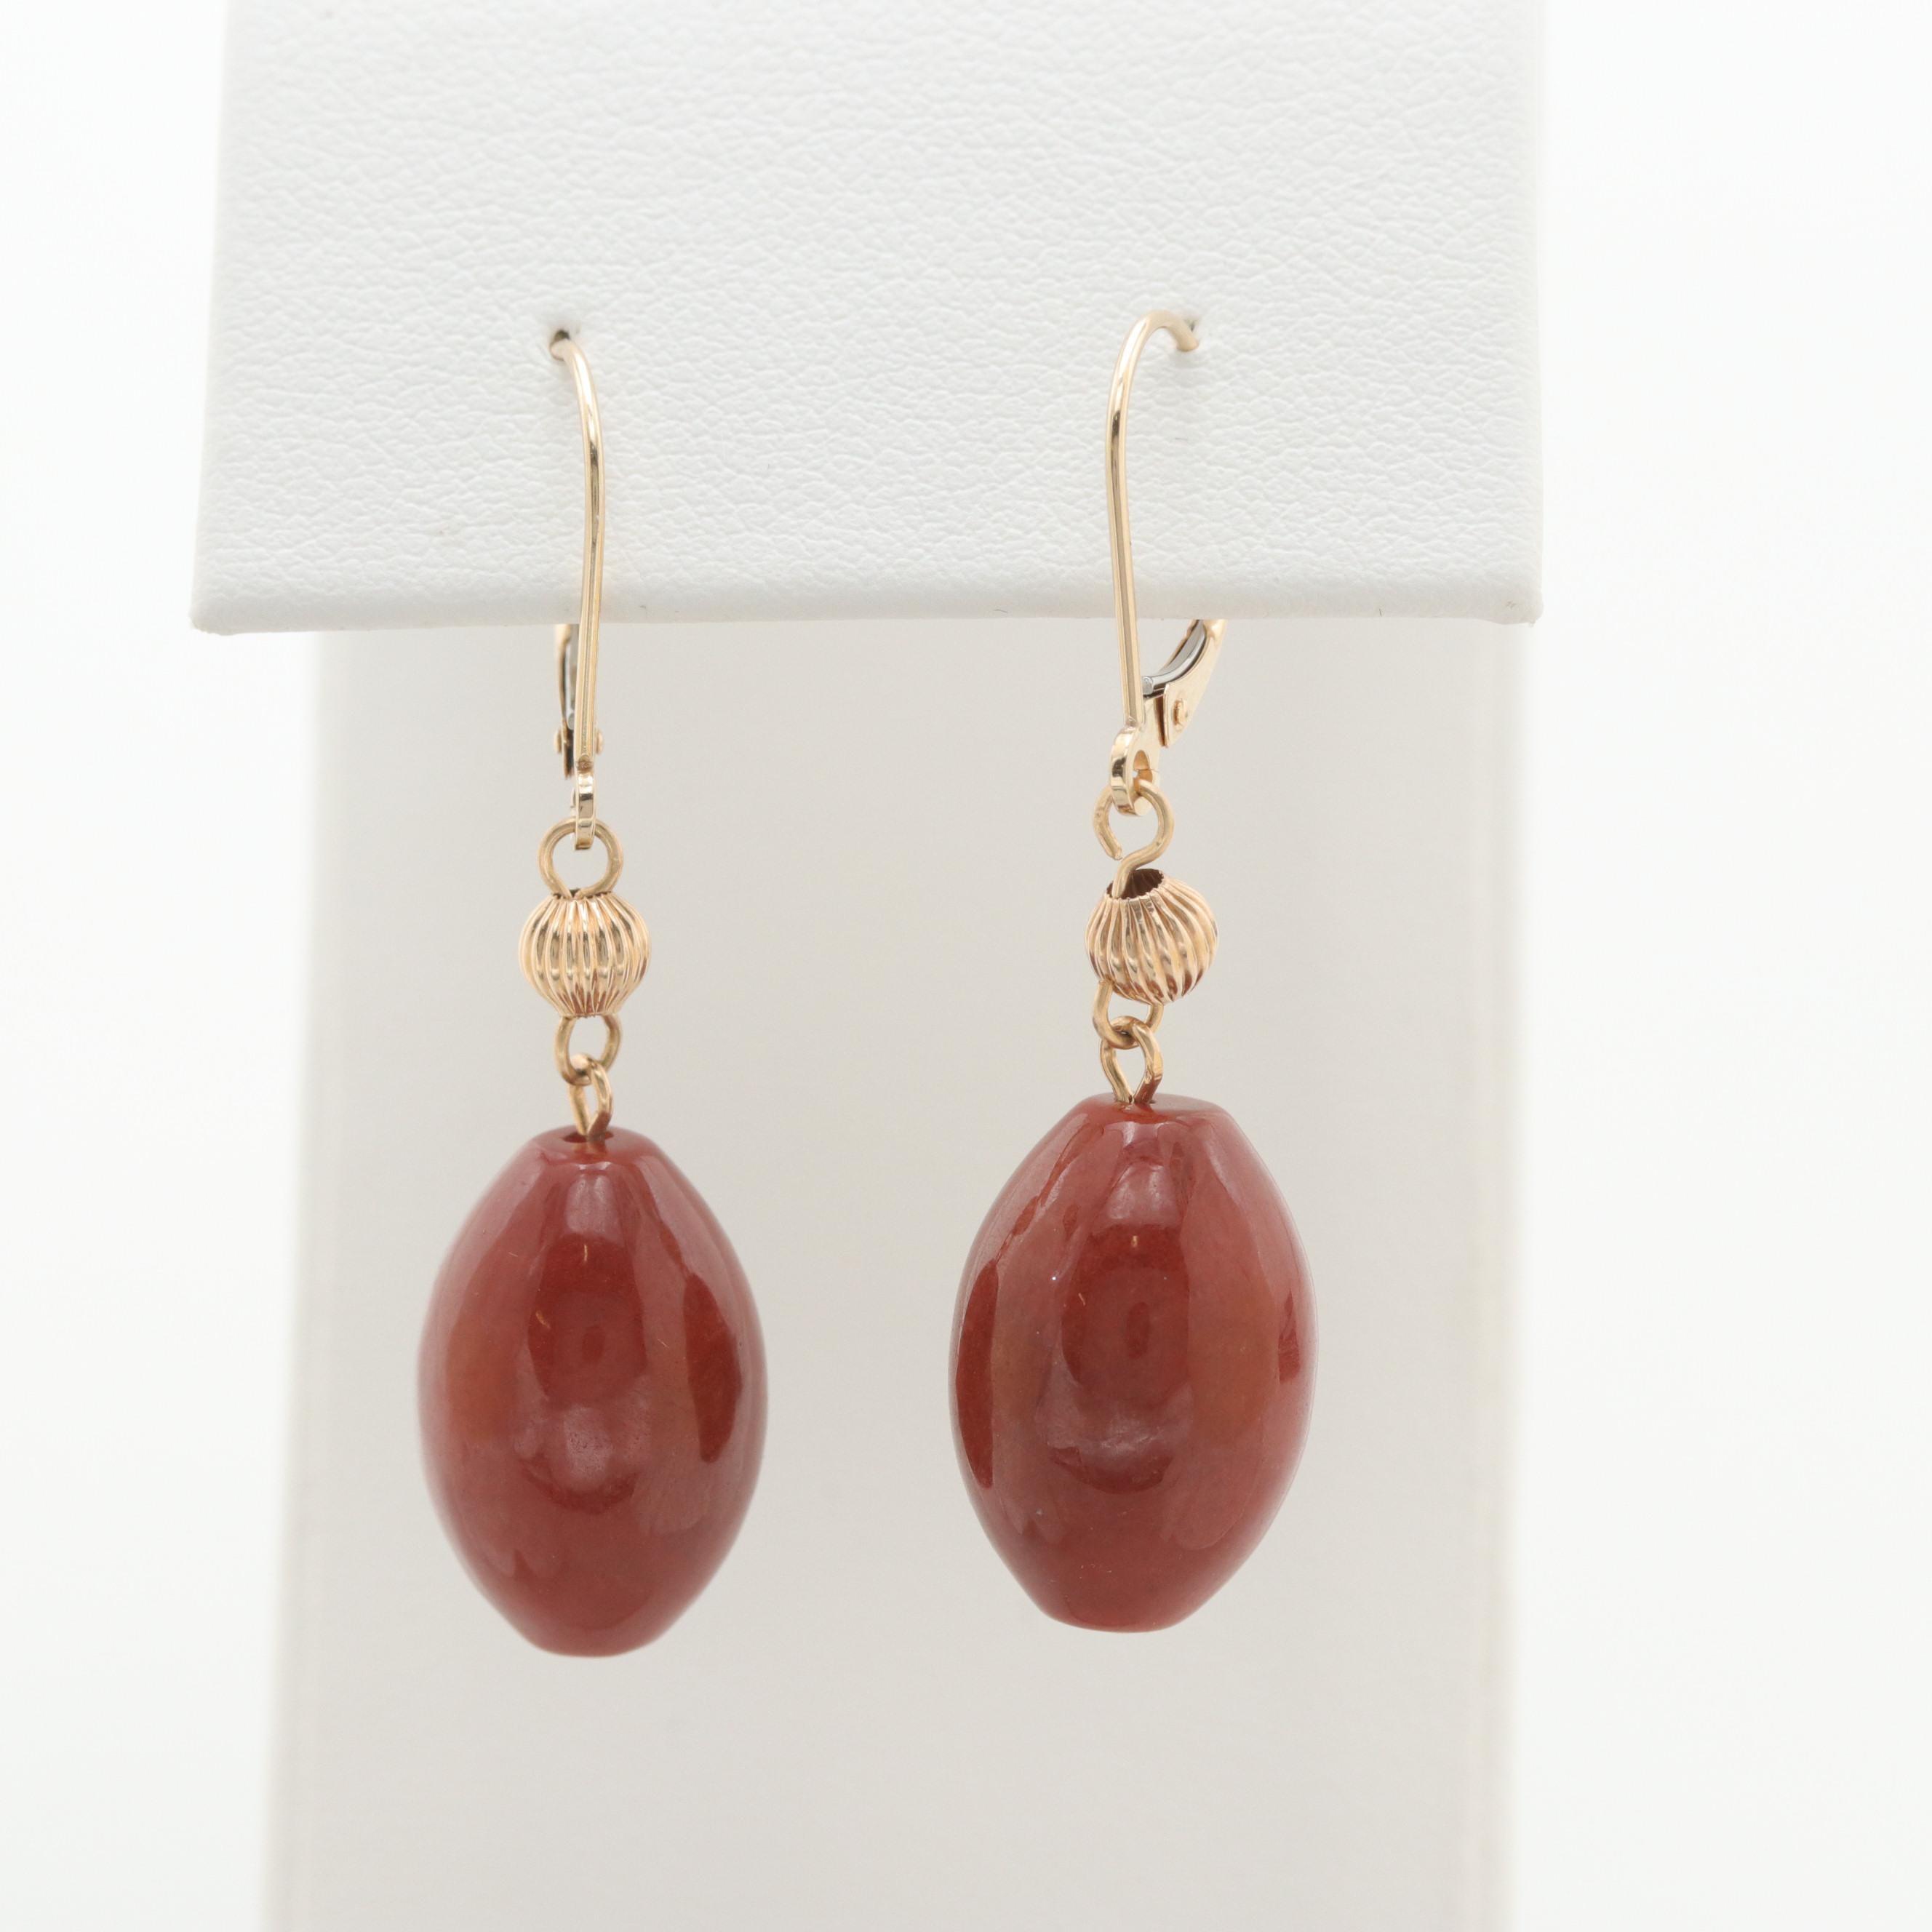 14K Yellow Gold Jadeite Dangle Earrings